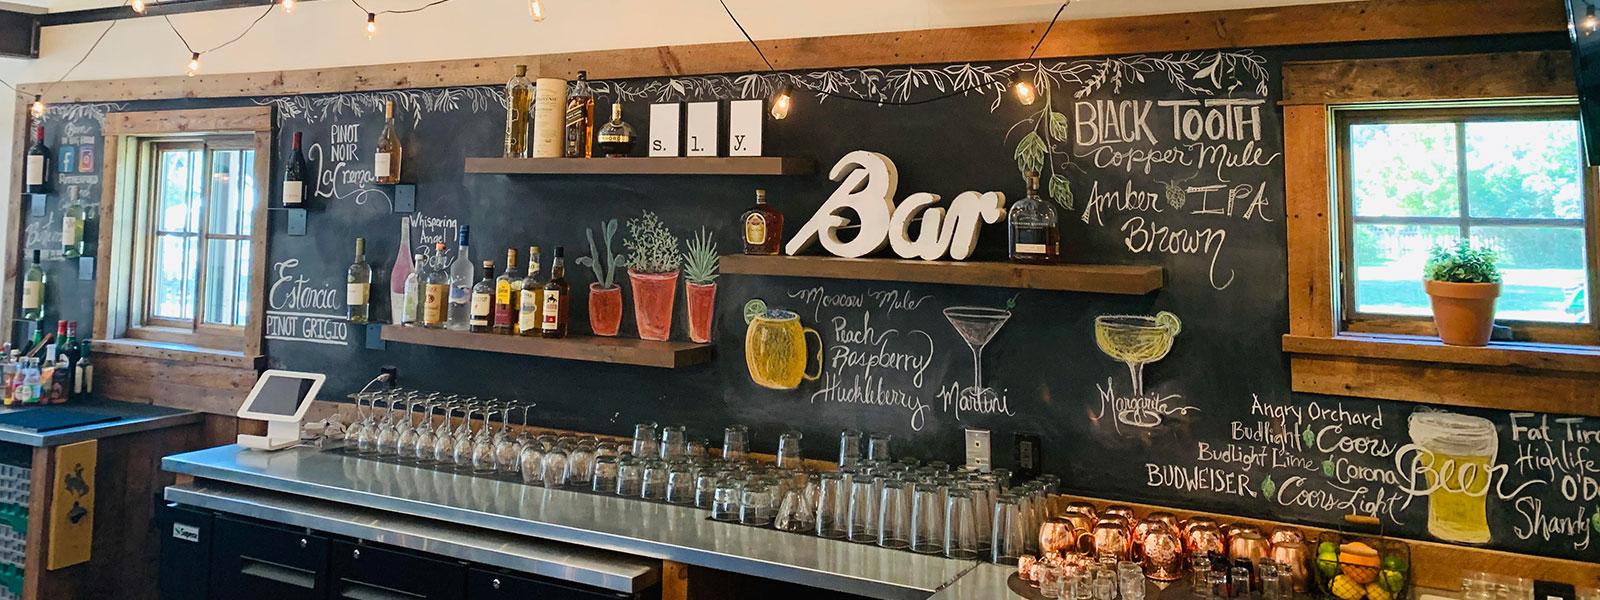 bar in big horn weddings, drinks, wine